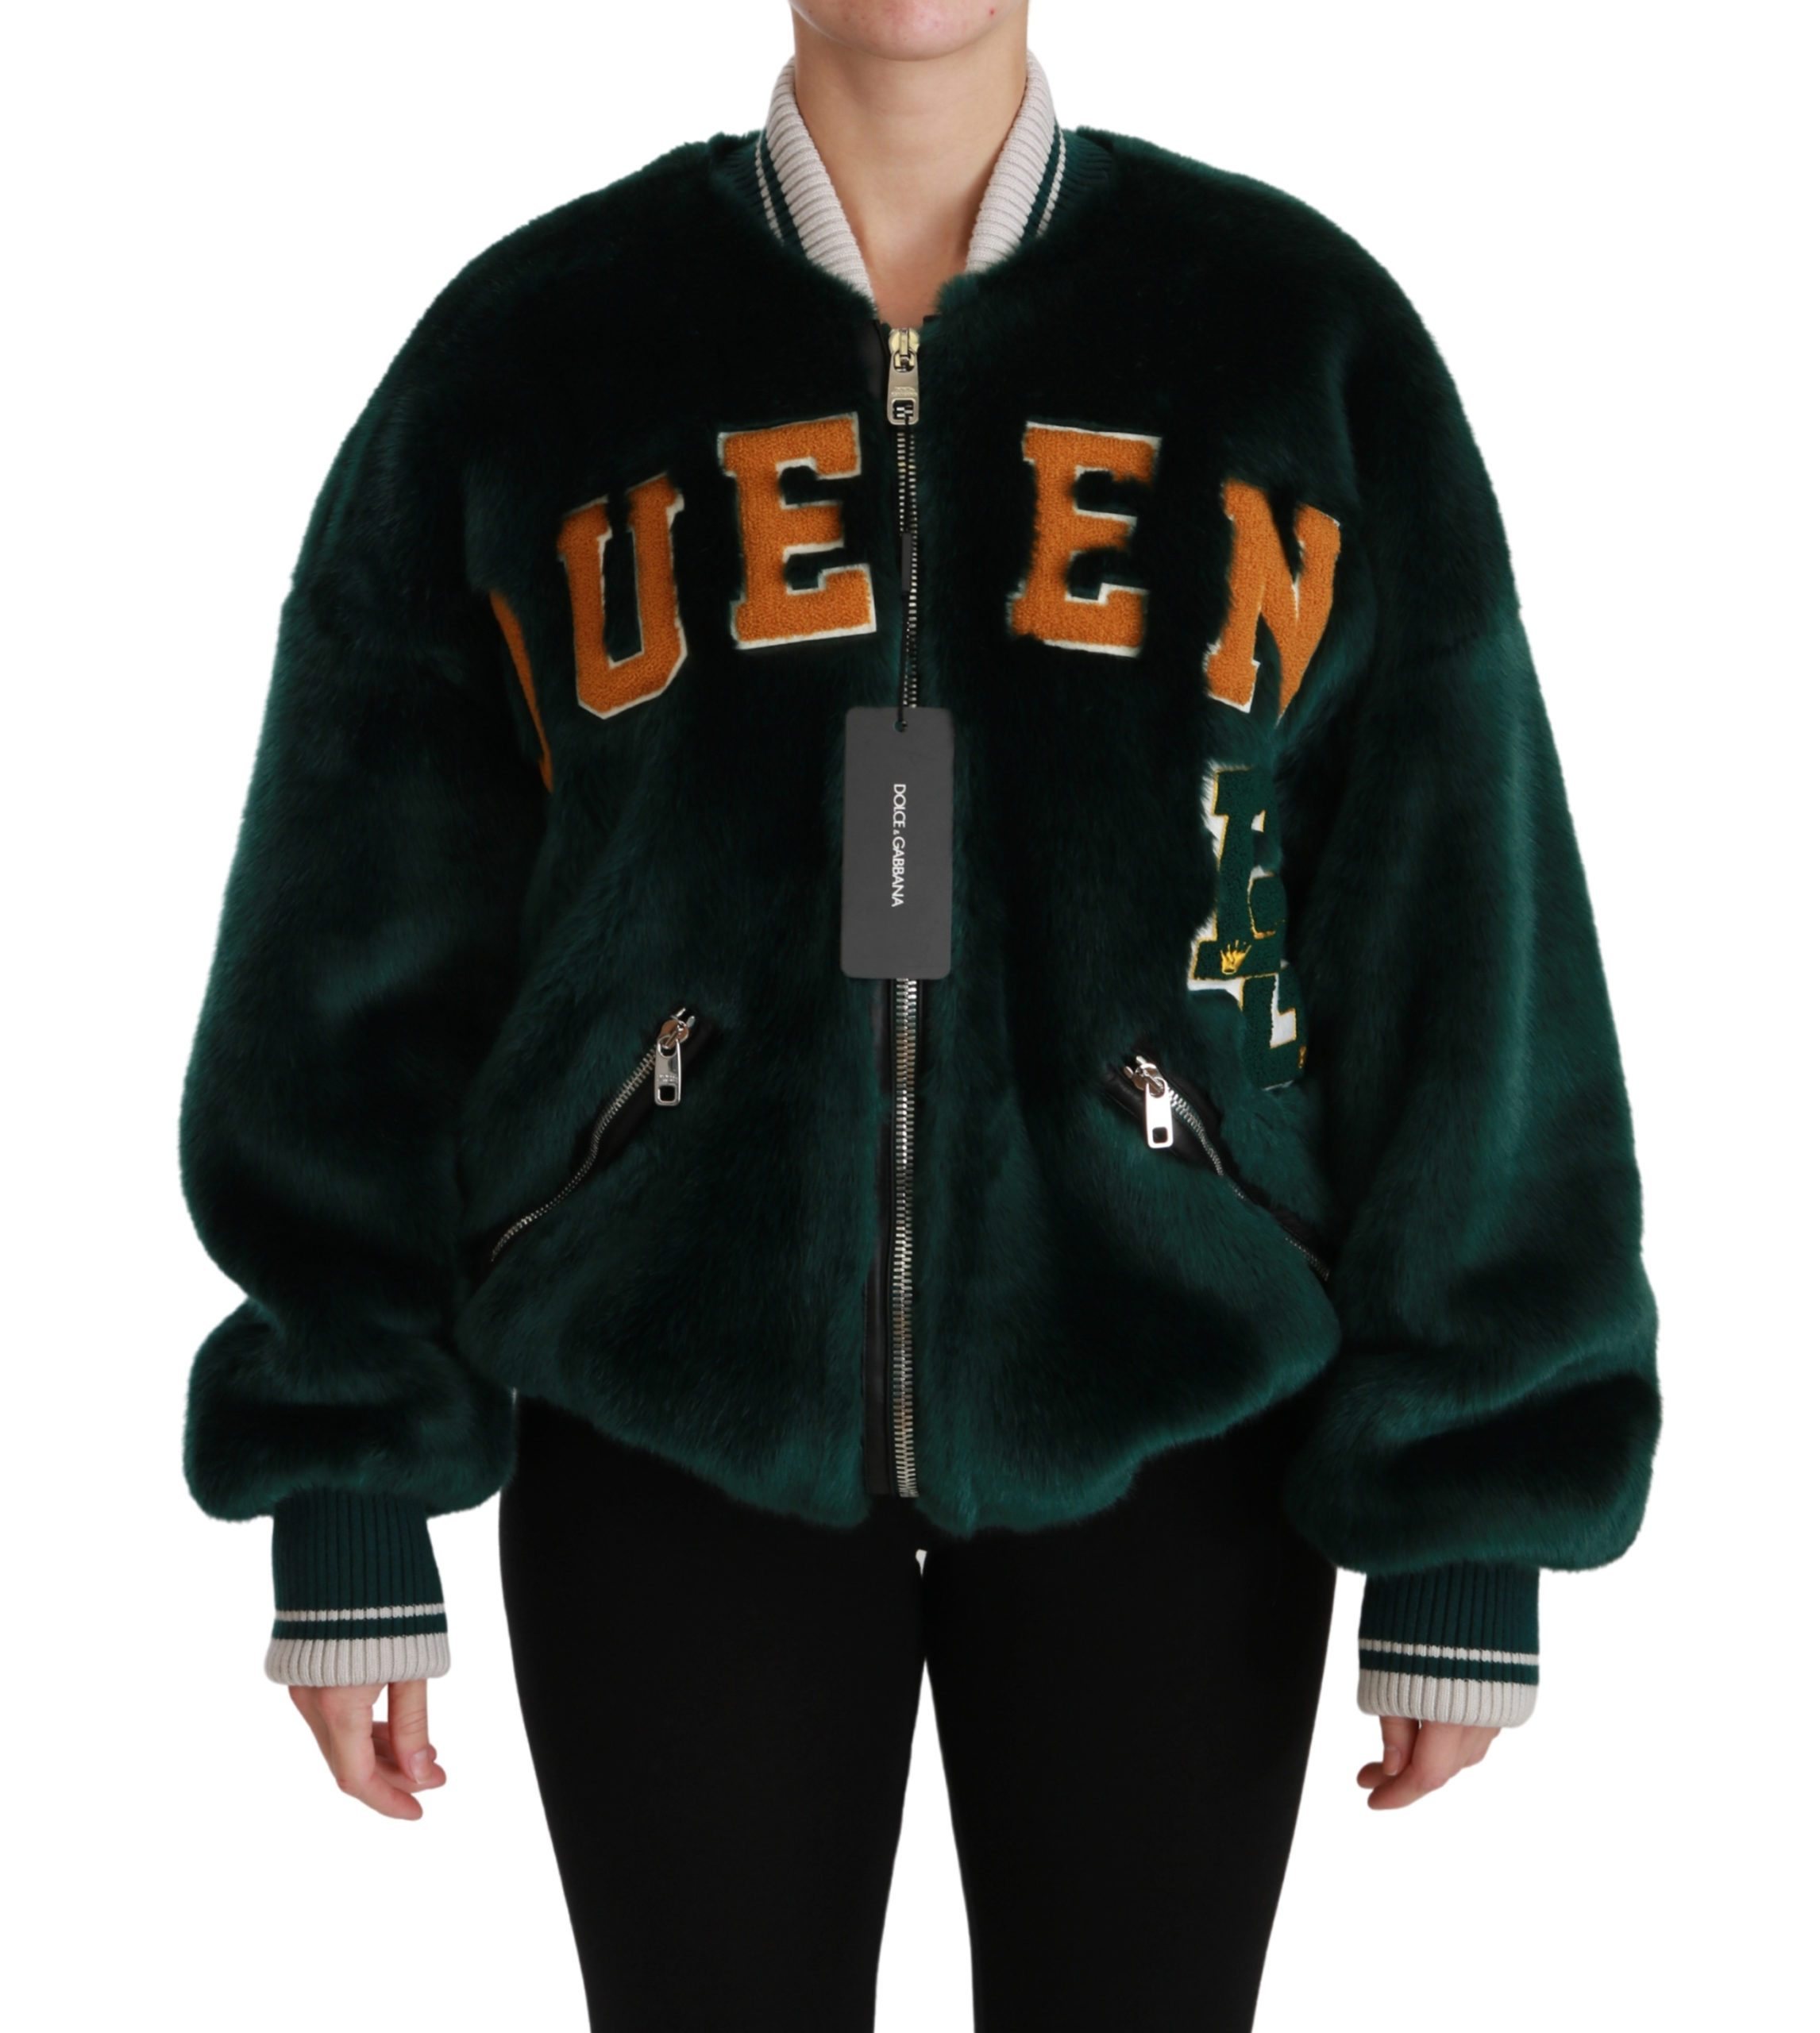 Dolce & Gabbana Women's Queen Faux Fur Bomber Jacket Green JKT2521 - IT38 | S